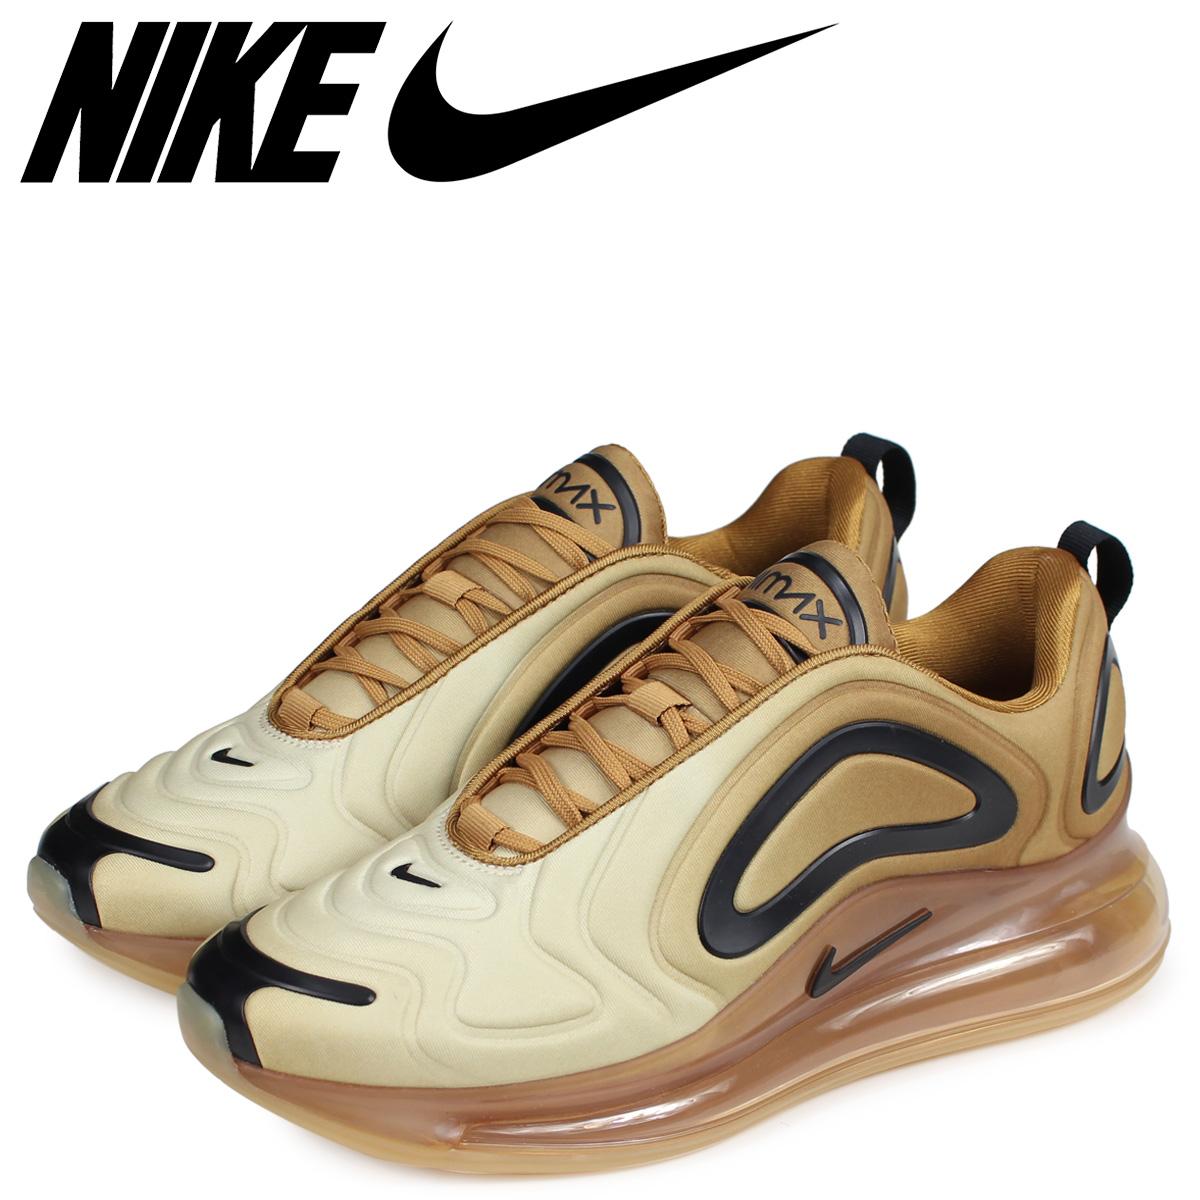 1b7a2ce046 Sugar Online Shop: NIKE Kie Ney AMAX 720 sneakers men AIR MAX 720 gold  AO2924-700 | Rakuten Global Market